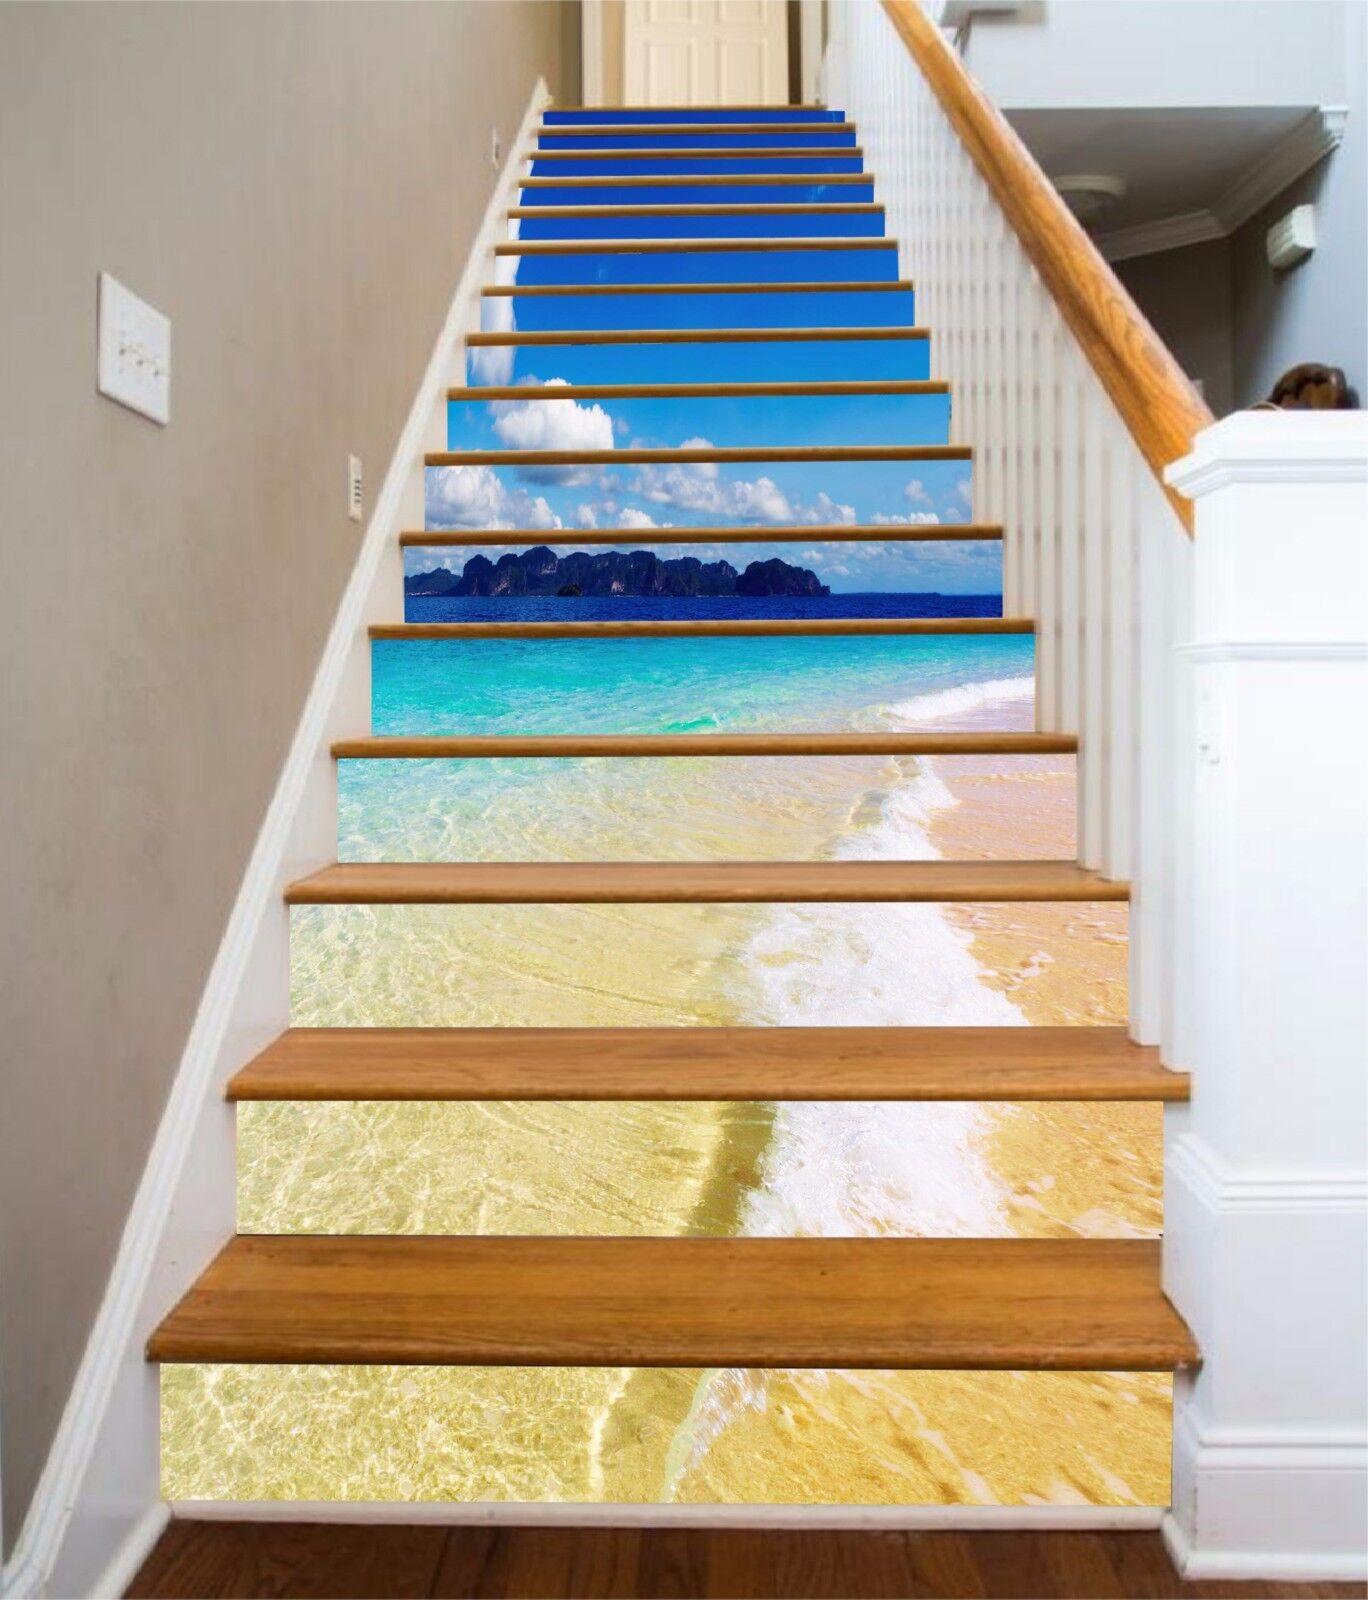 3D Sky beach 355  Stair Risers Decoration Photo Mural Vinyl Decal Wallpaper UK